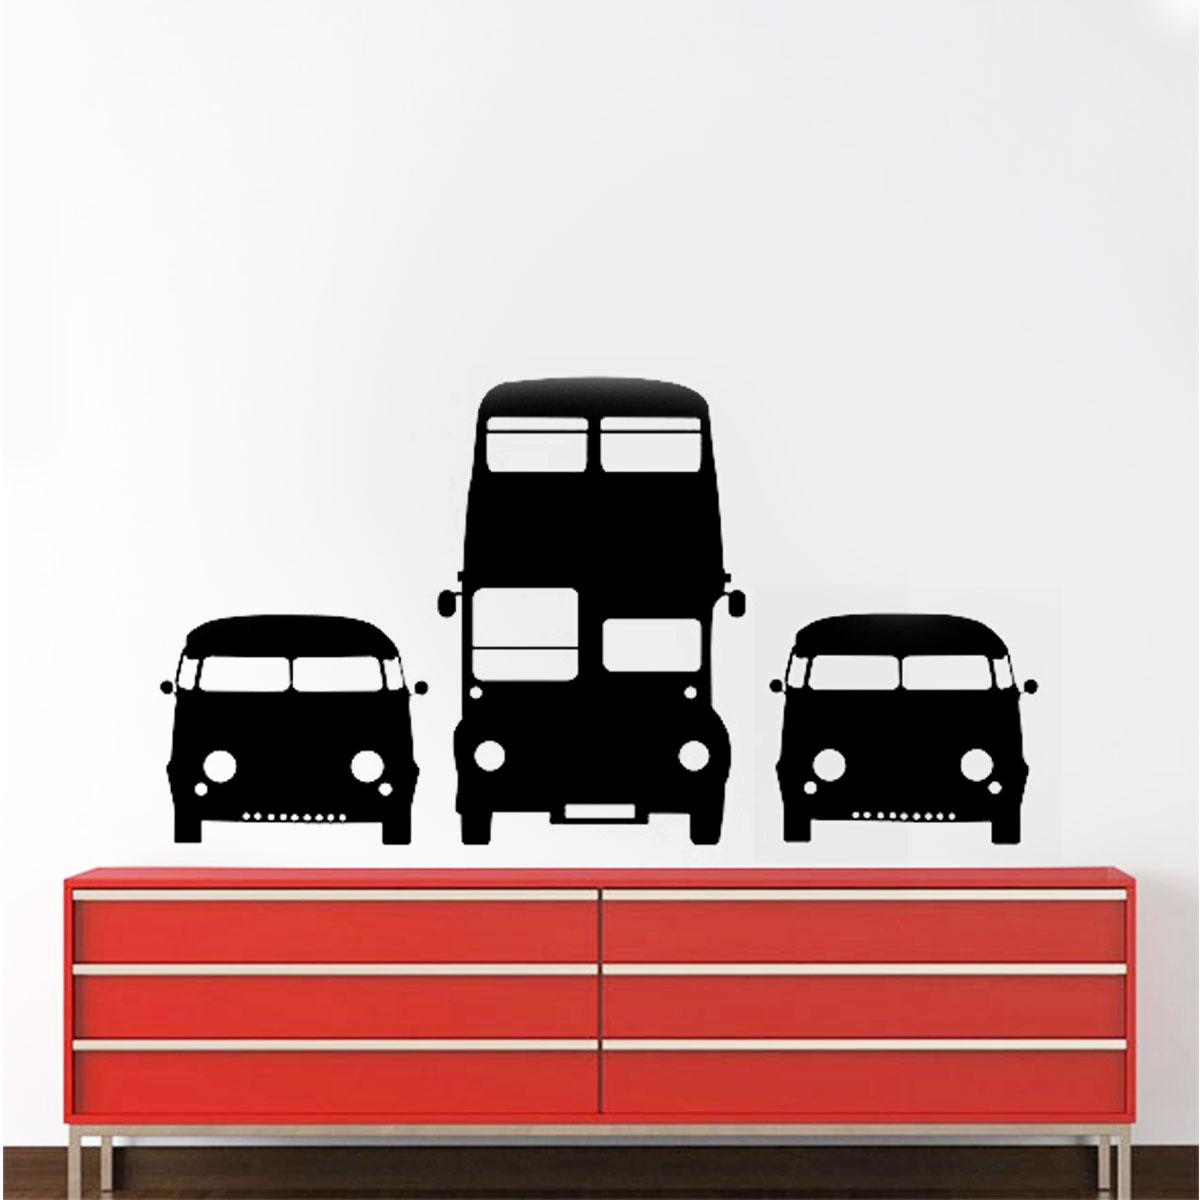 Armario Joyero Pared Ikea ~ Adesivo De Parede Carros Retr u00f4 Kombi Minimalista